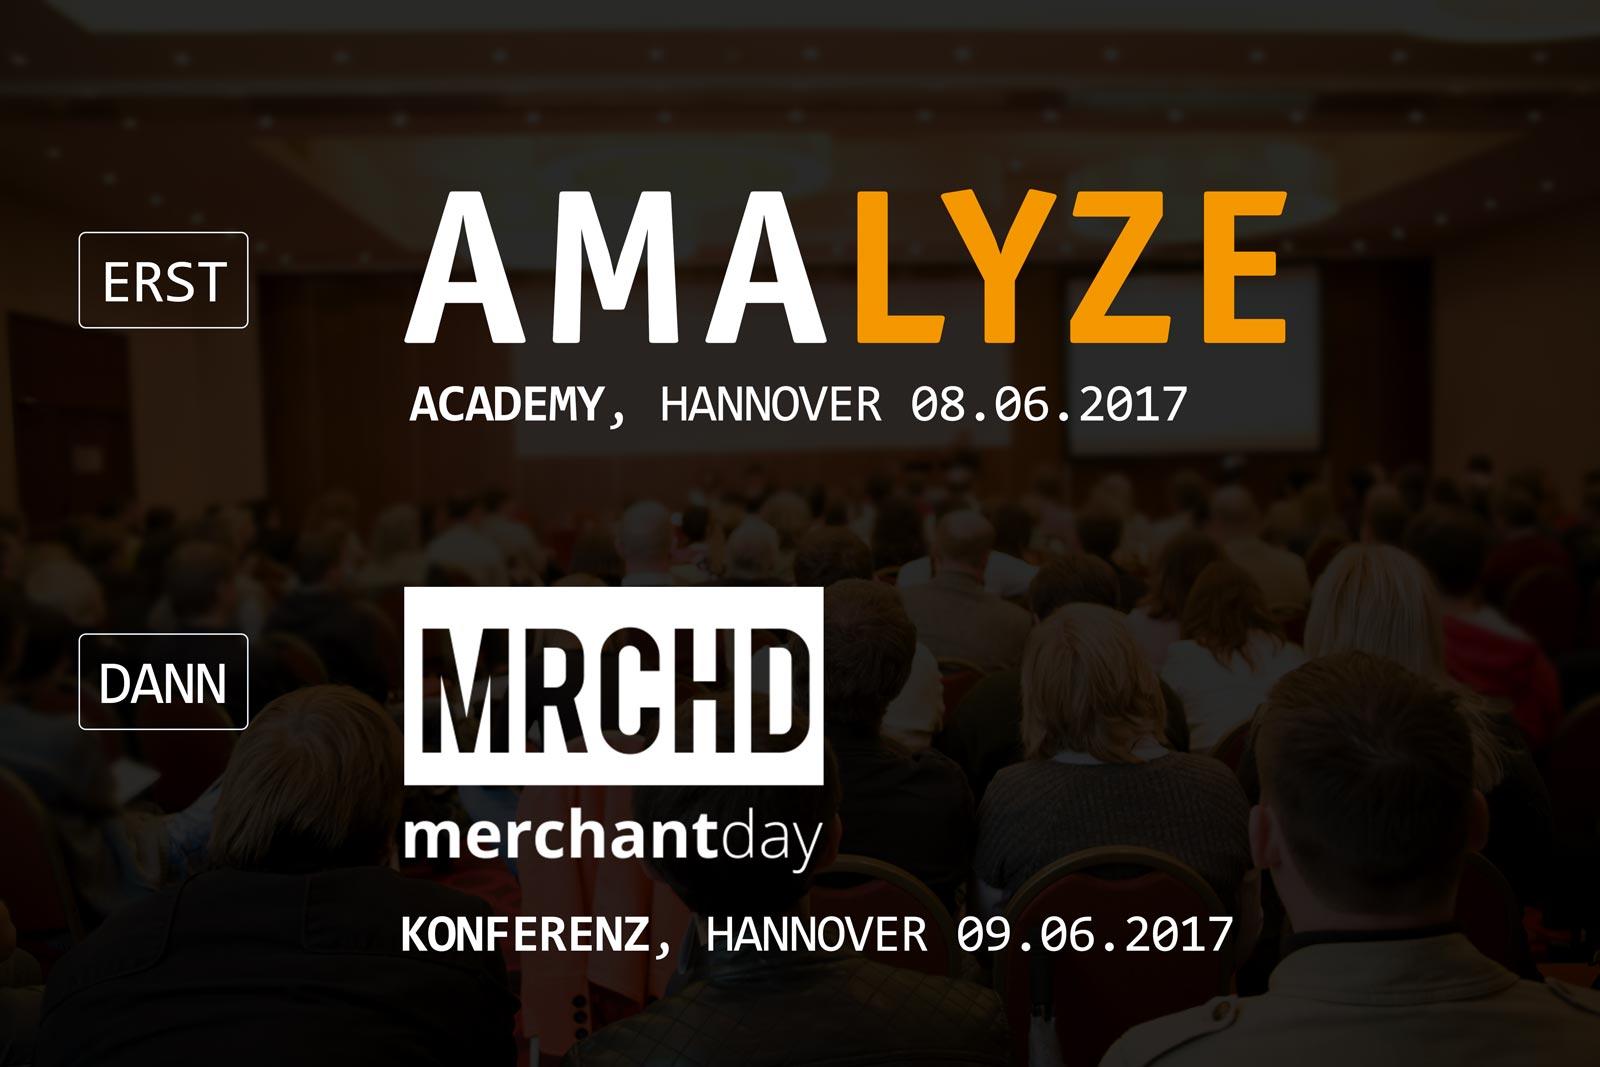 amalyze-academy-merchantday-konferenz-2017